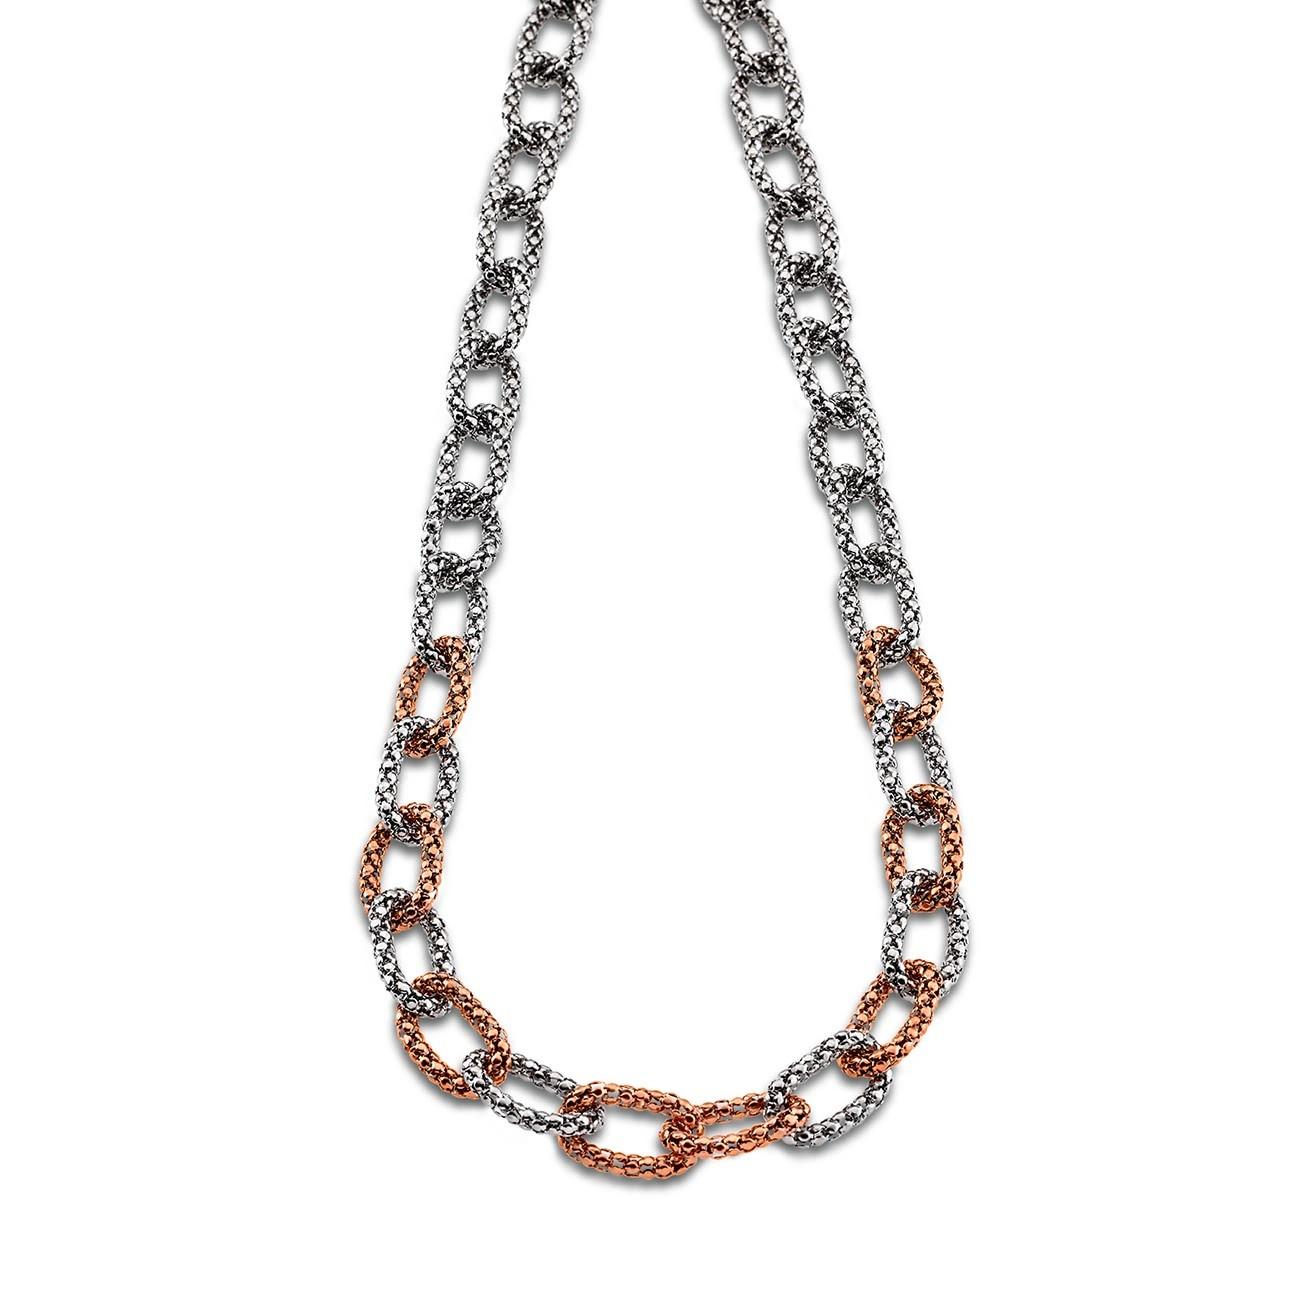 LOTUS Style Halskette Damen Edelstahl LS1825-1/2 Bicolor-Schmuck JLS1825-1-2